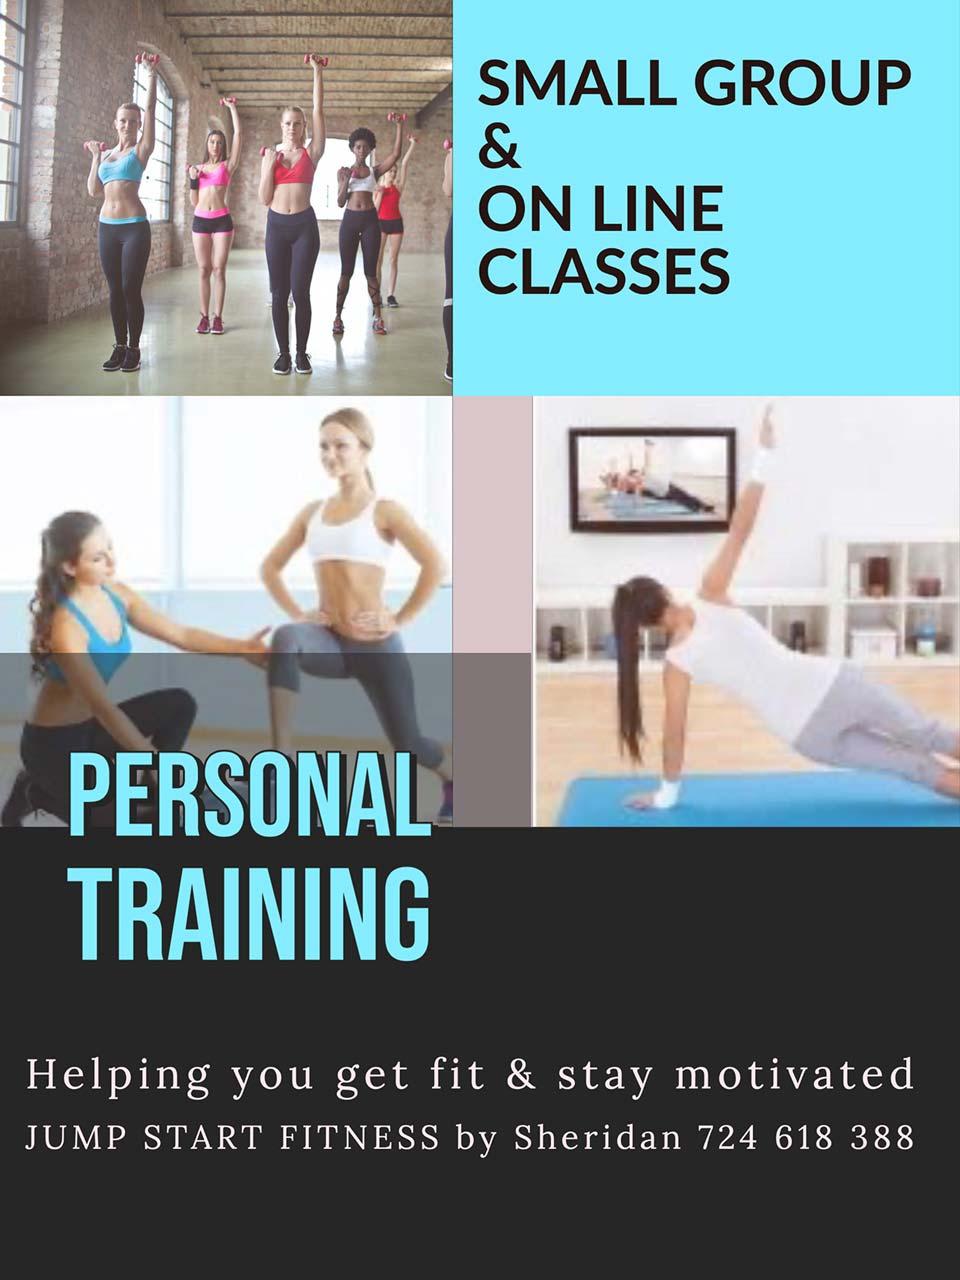 jump-start-fitness